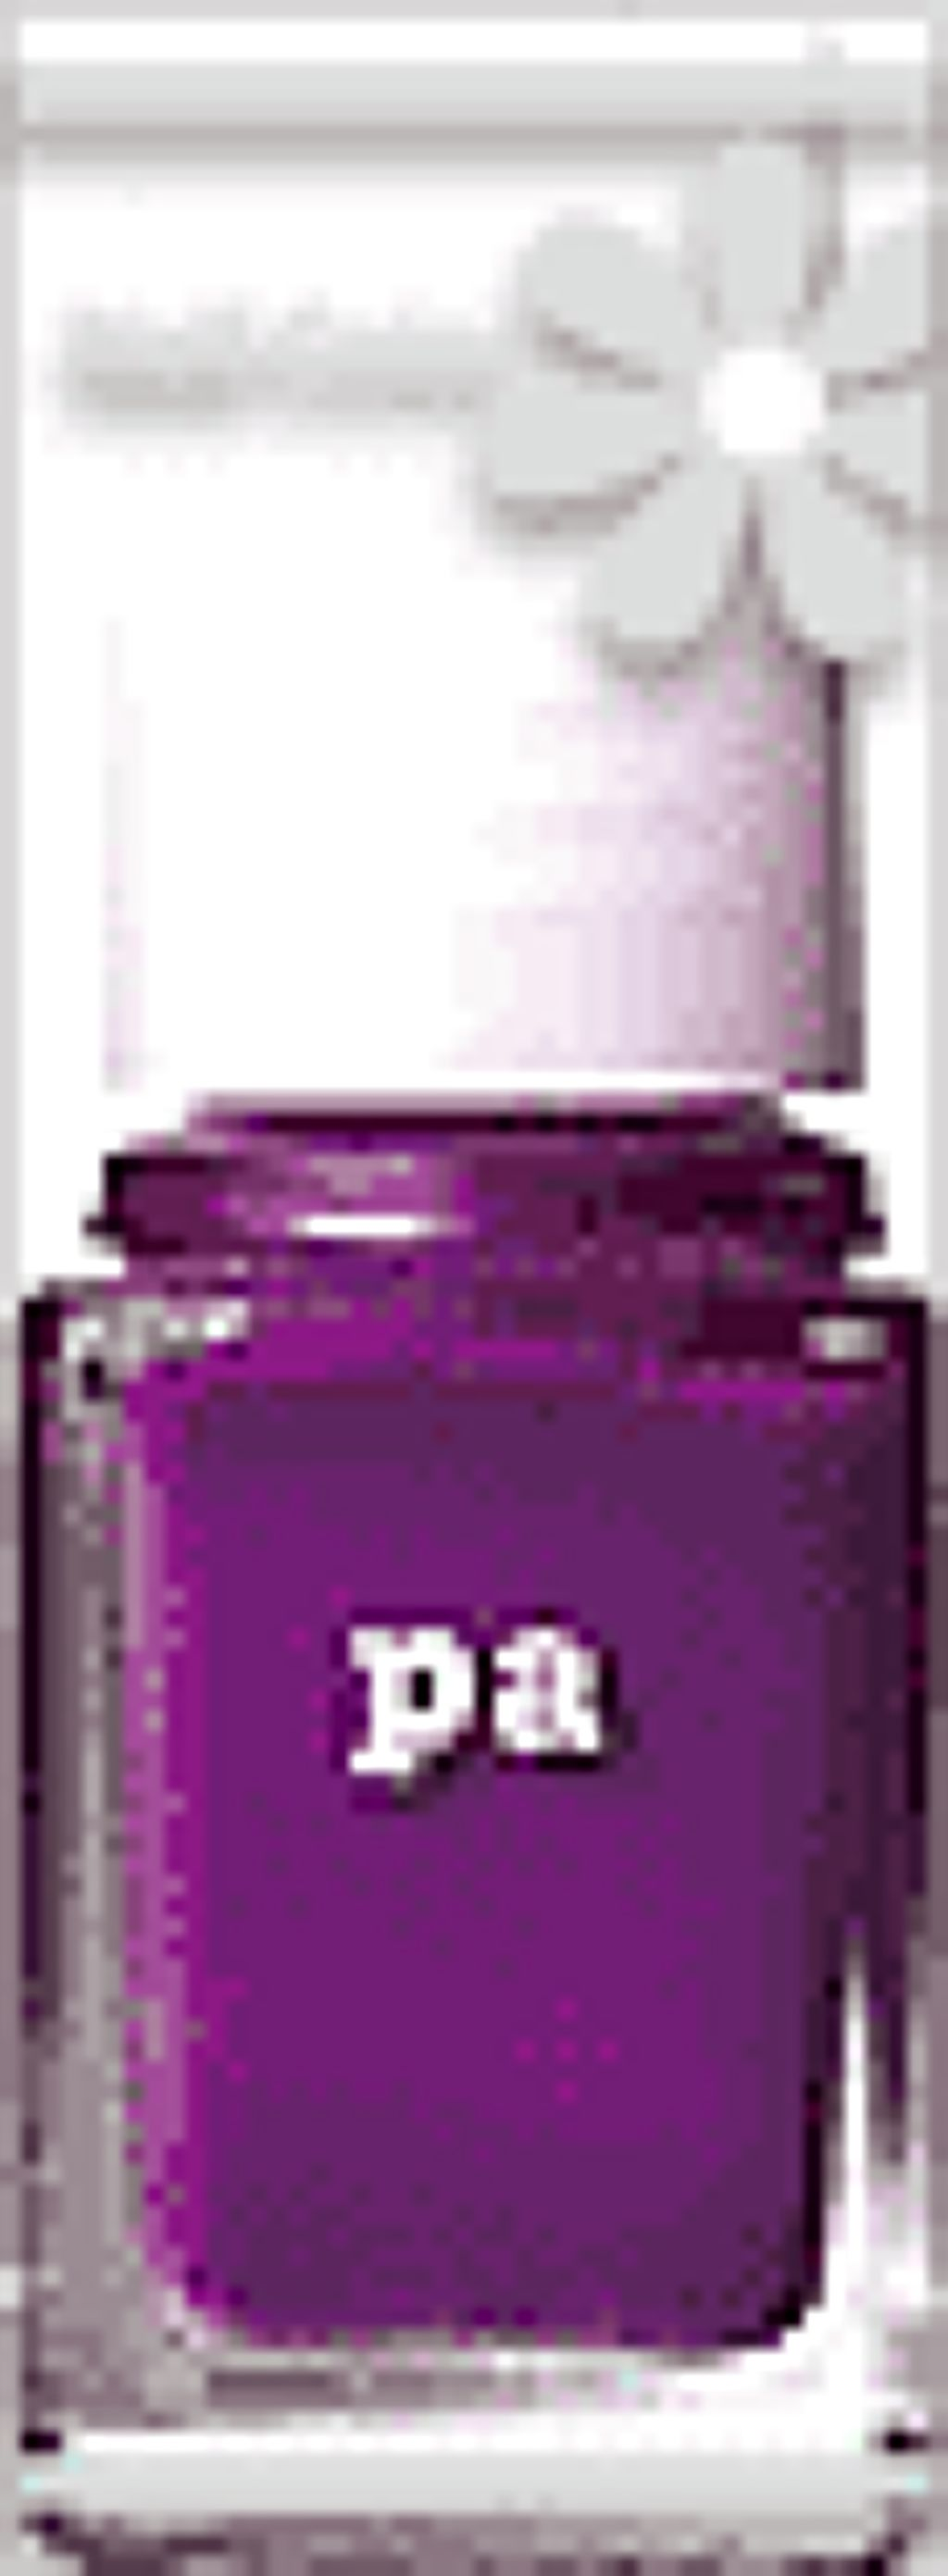 pa ネイルカラー(旧) A97